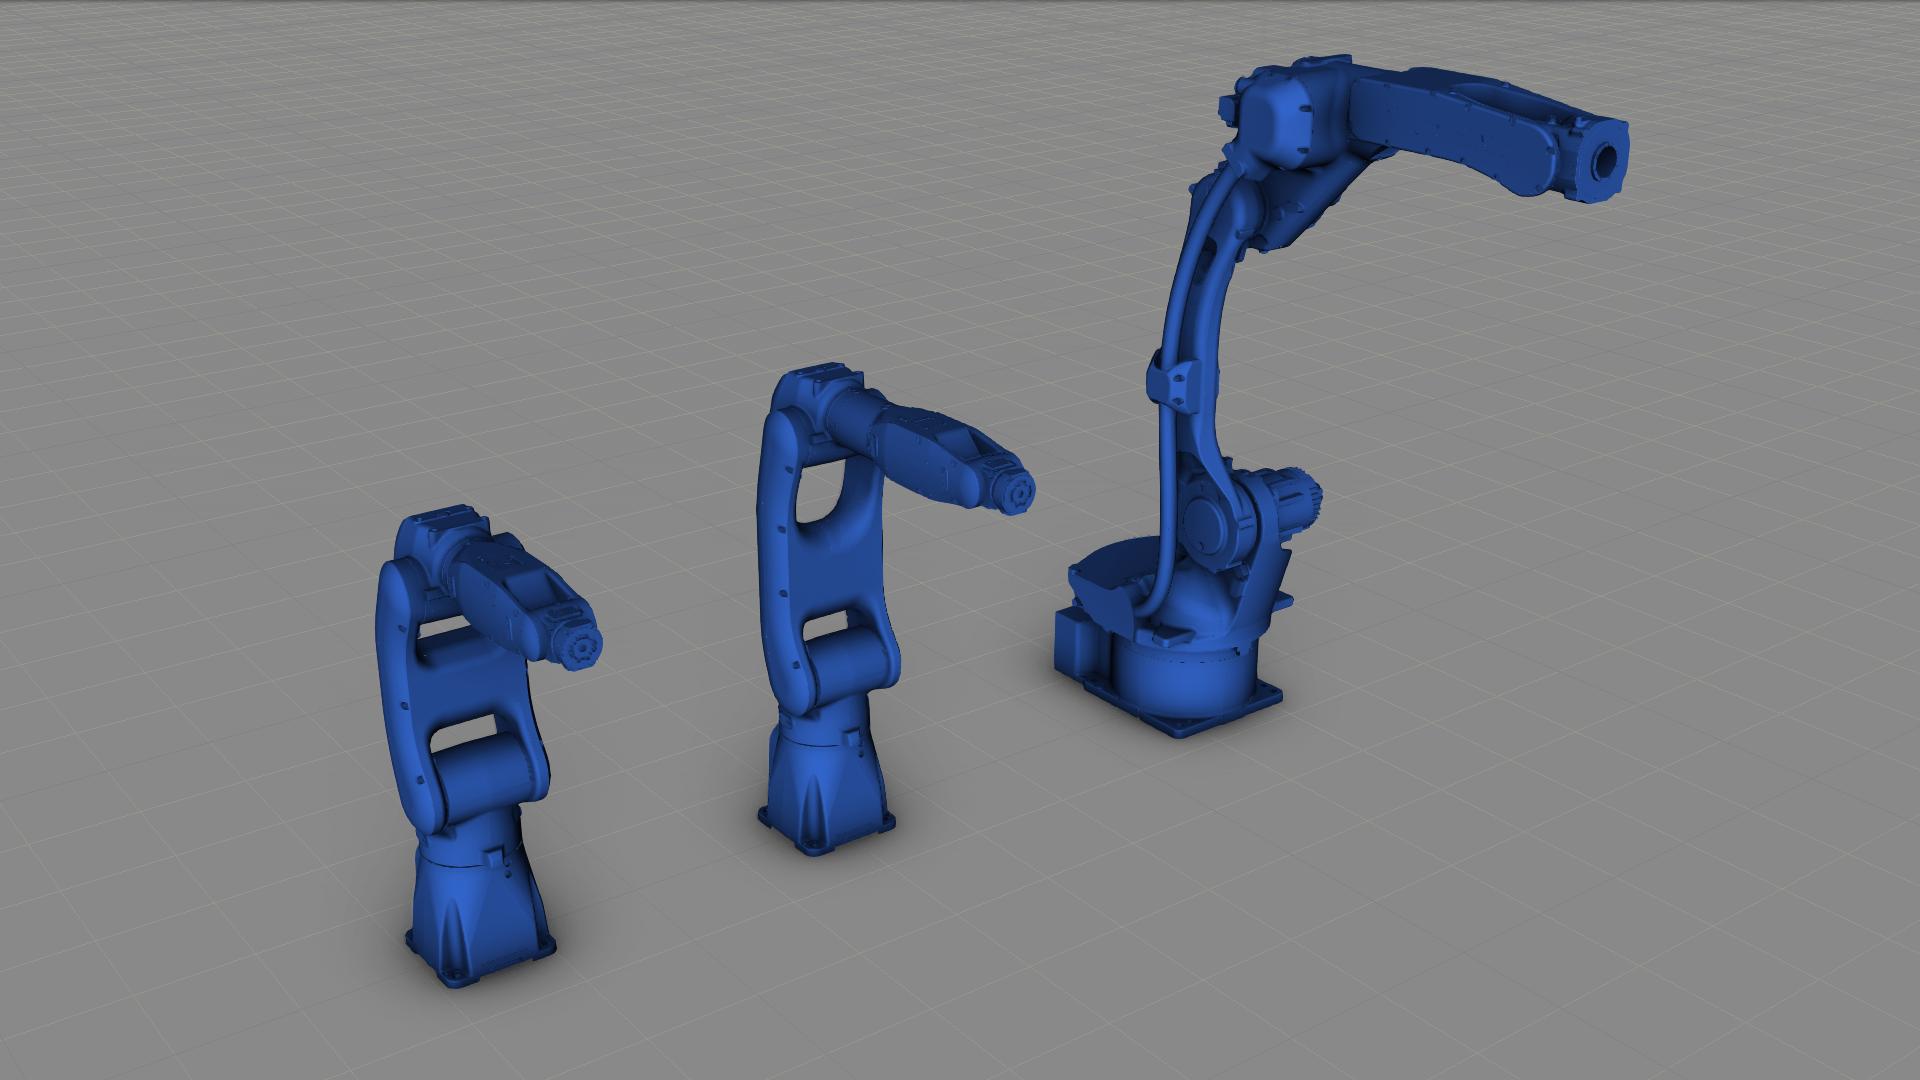 Collection of new Yaskawa robots in eCatalog